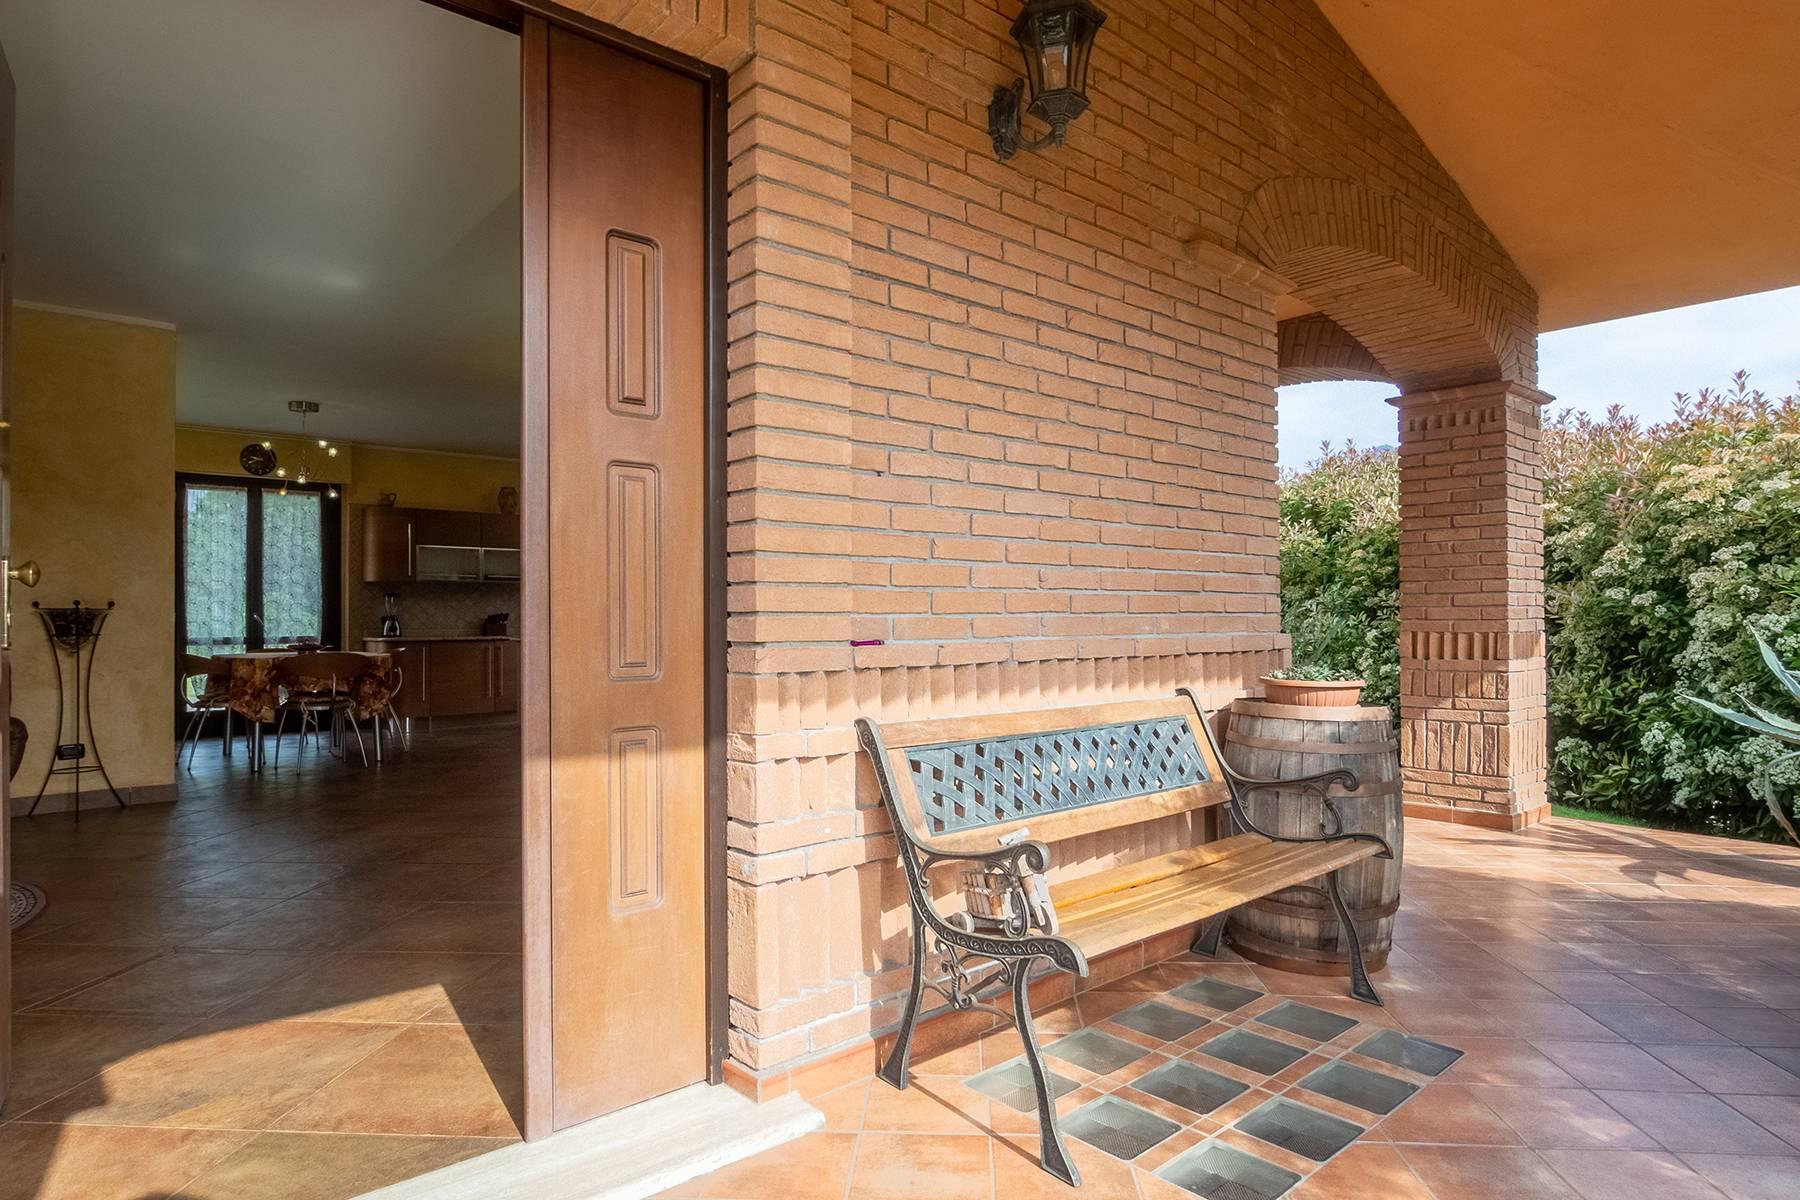 Villa in Vendita a Rosta: 5 locali, 182 mq - Foto 4